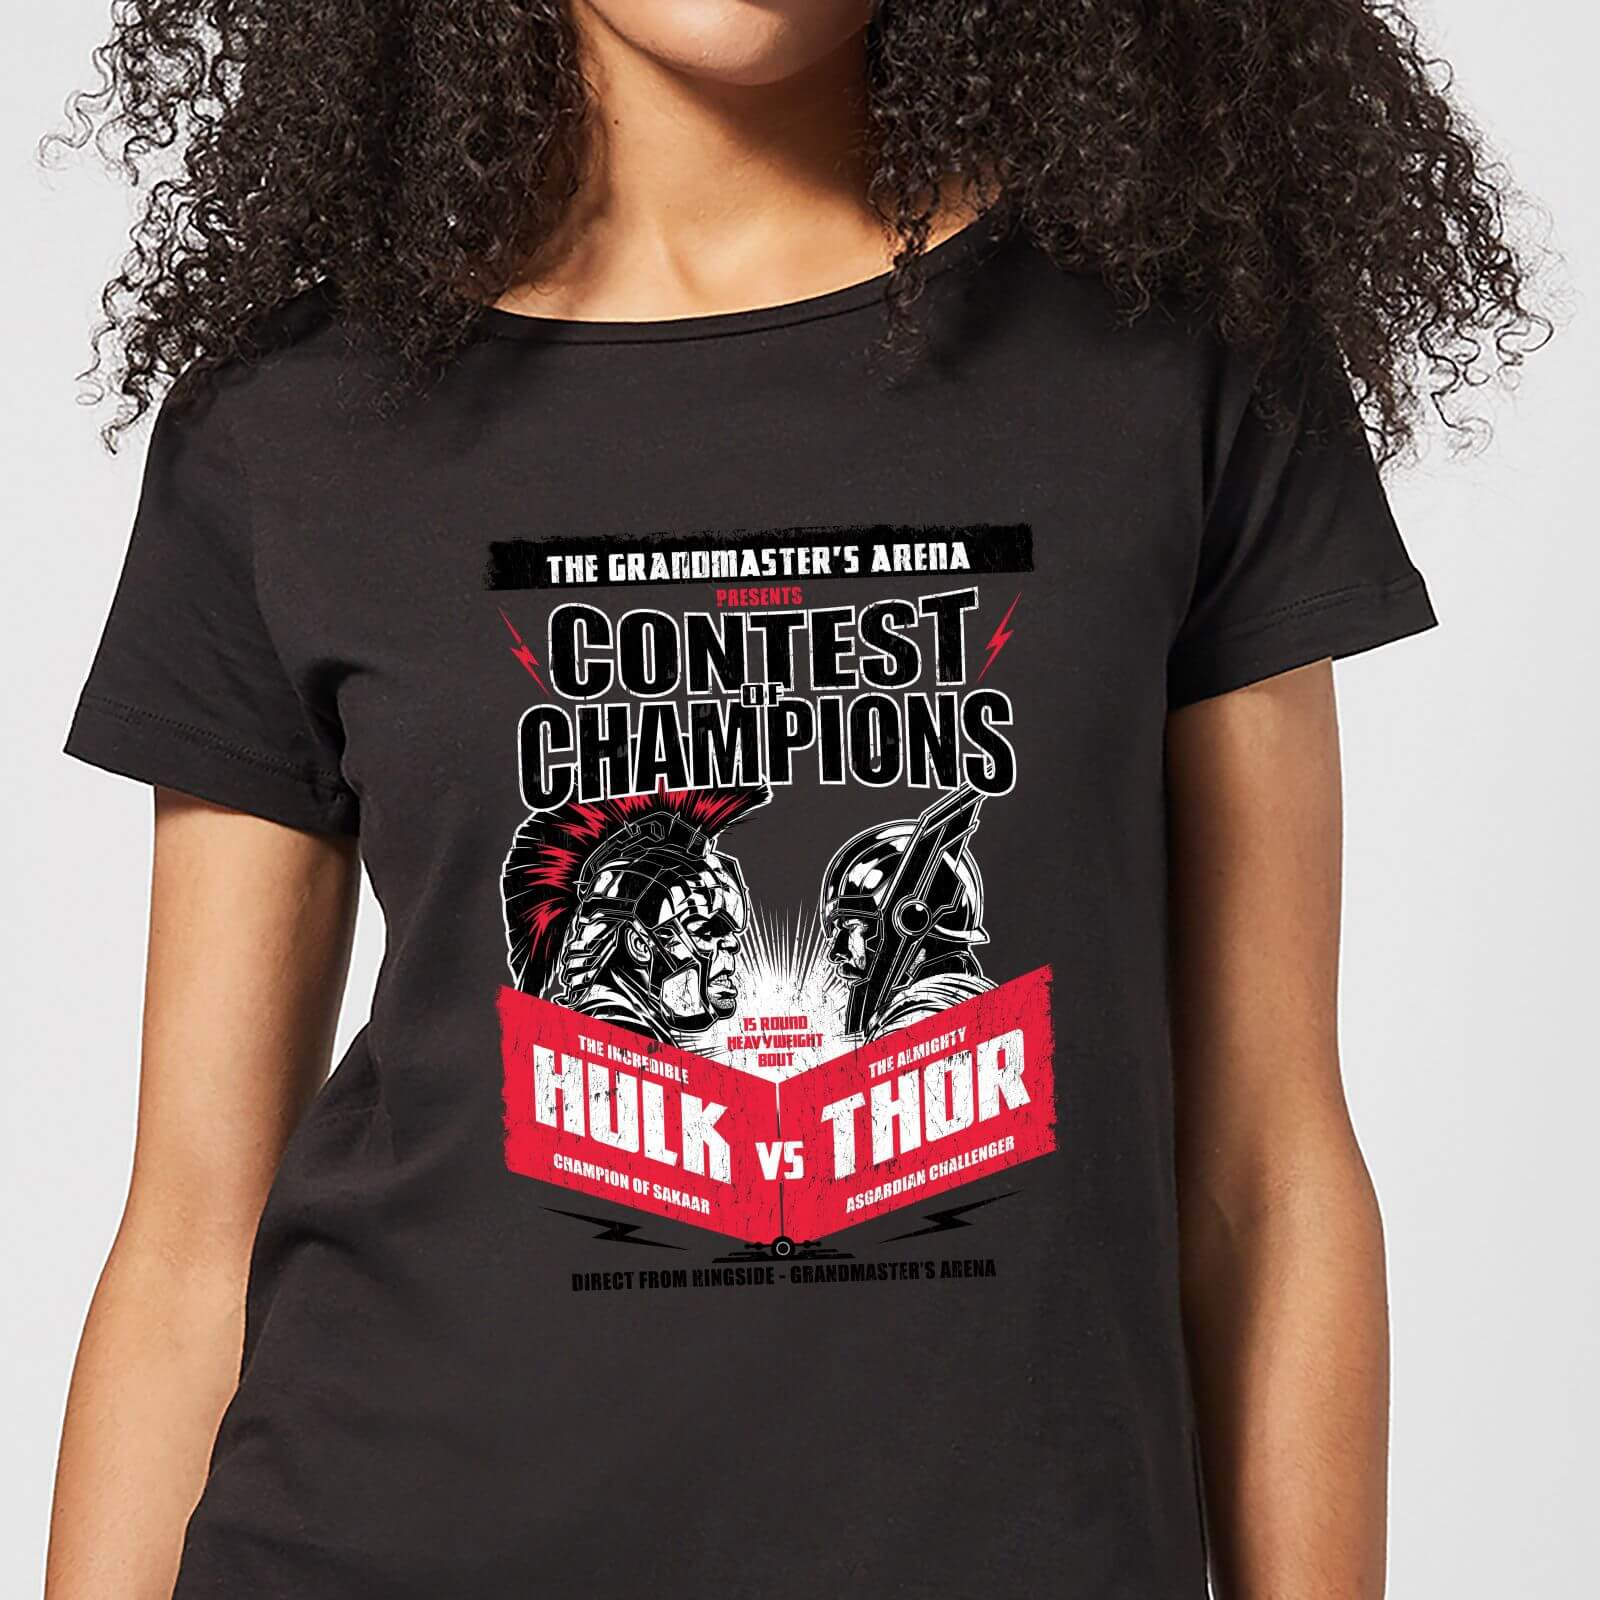 OfferteWeb.click 62-t-shirt-marvel-thor-ragnarok-champions-poster-nero-donna